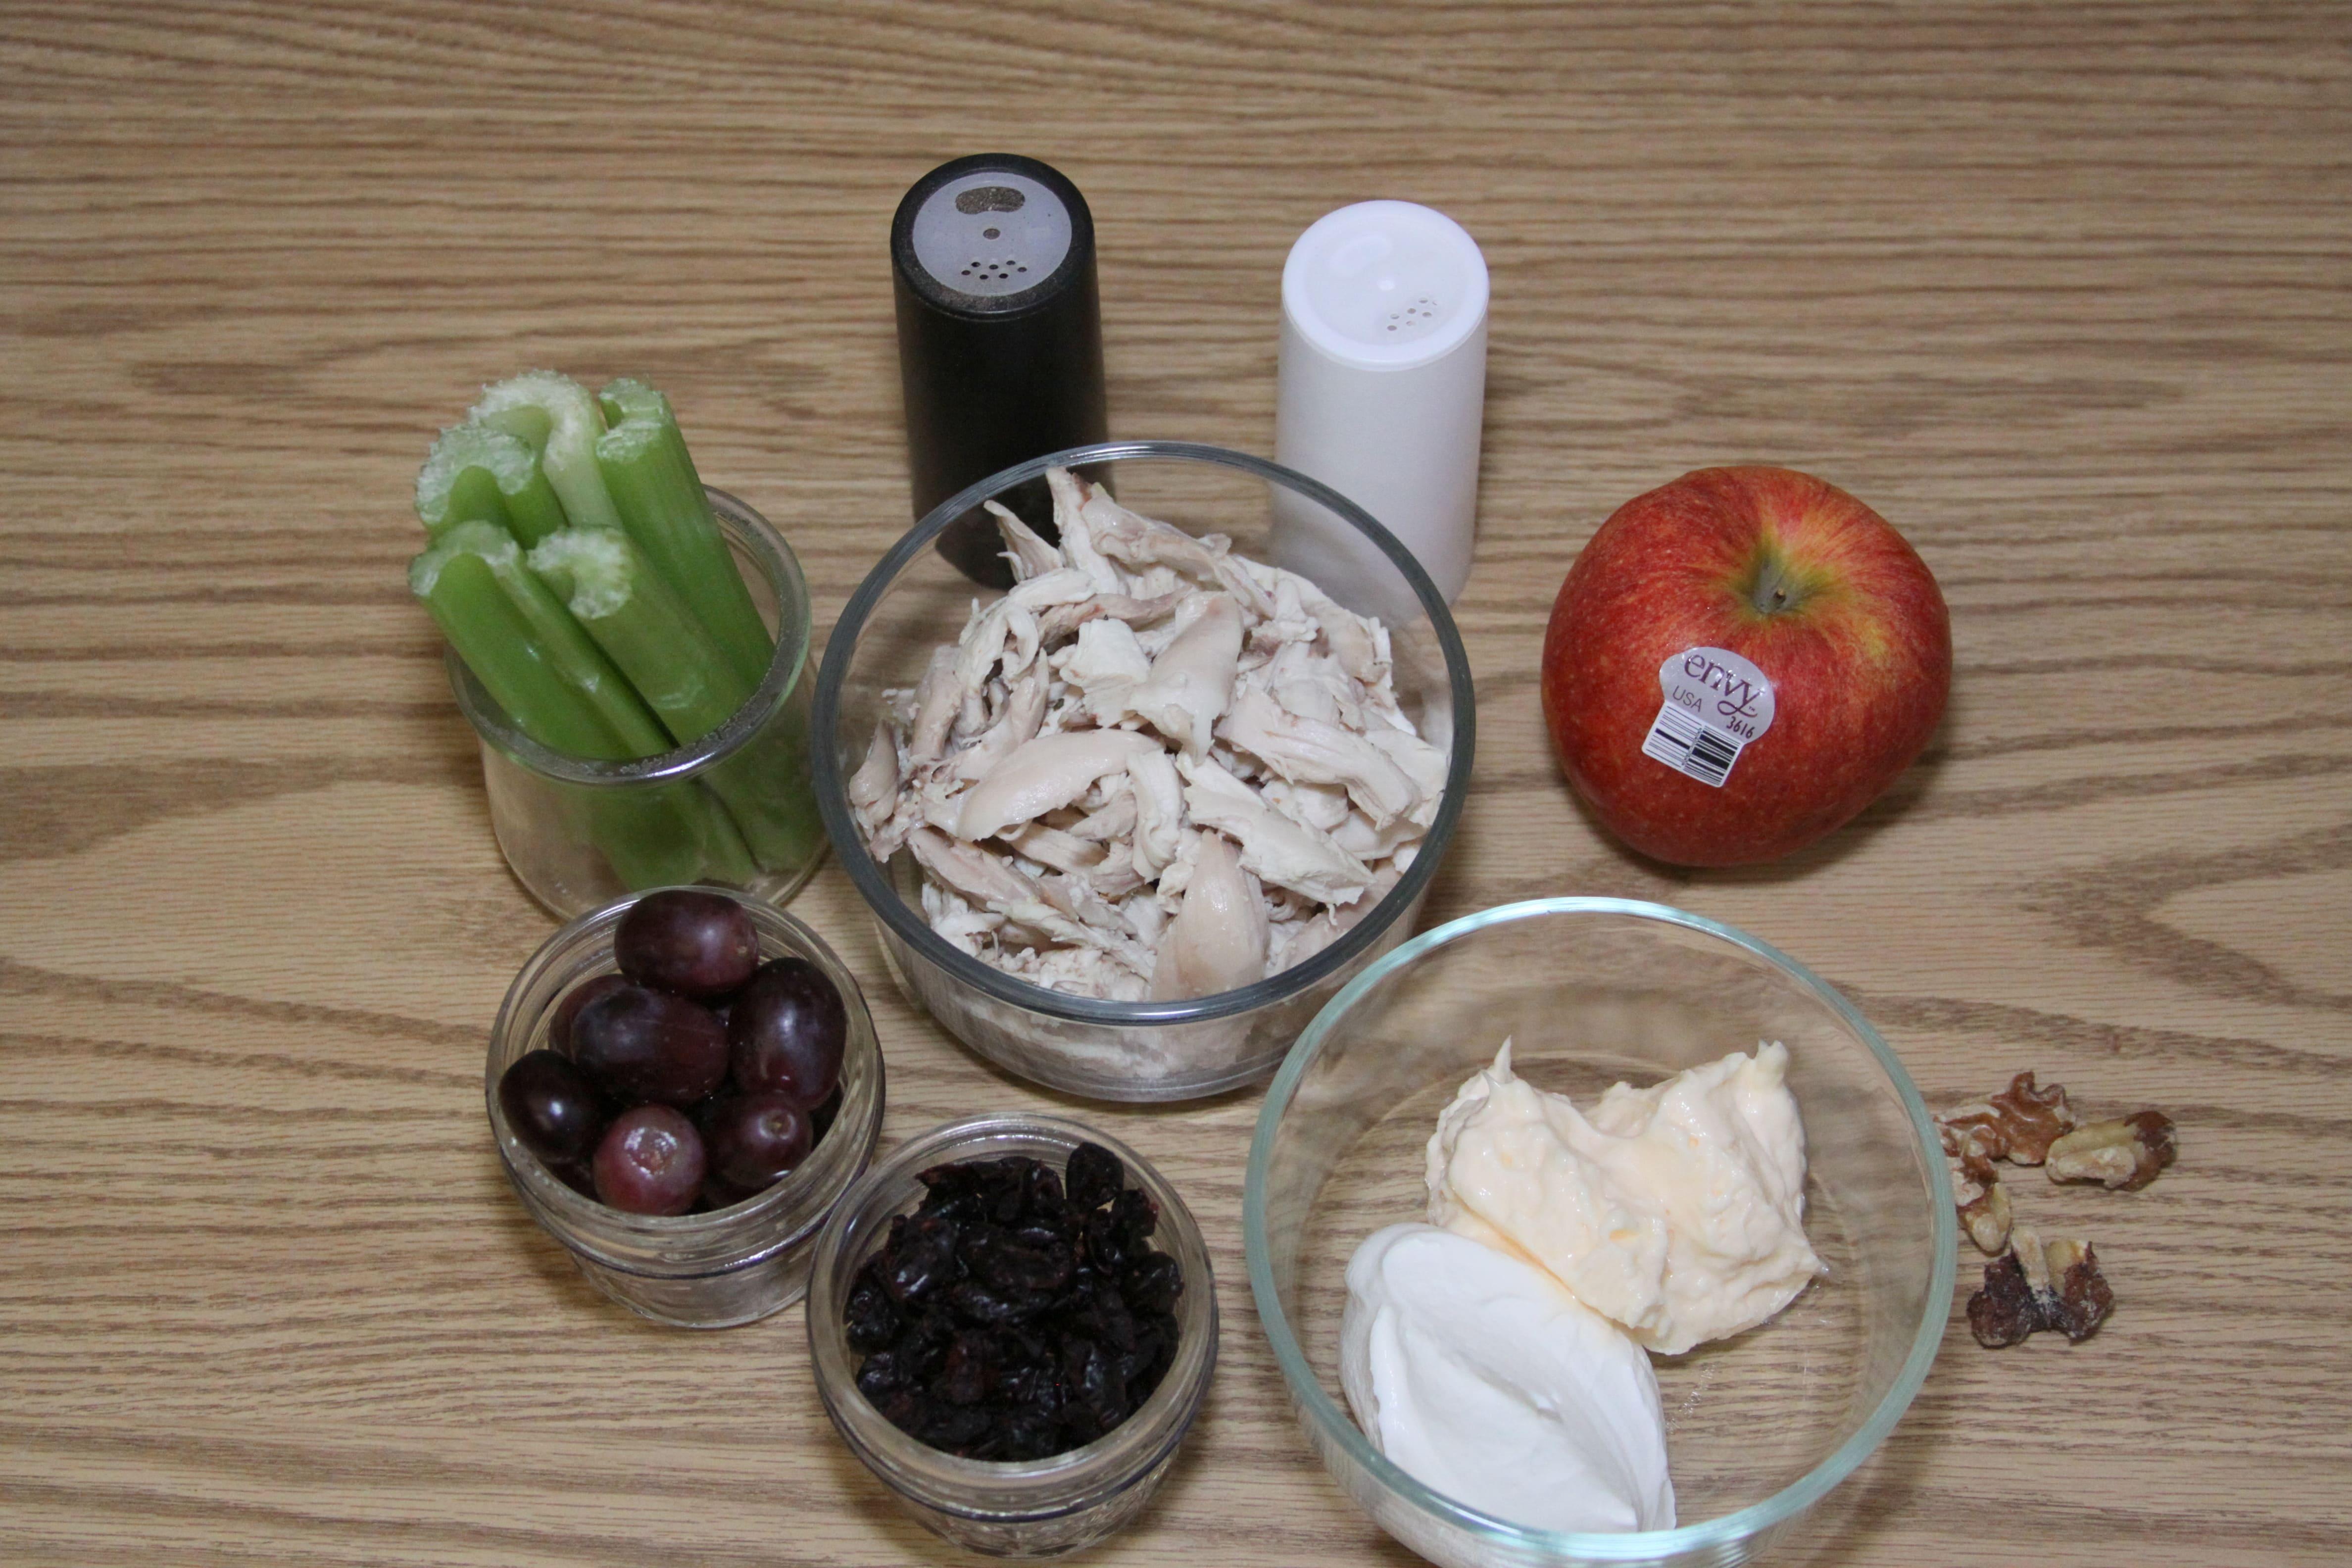 Cran Apple Chicken Salad Ingredients